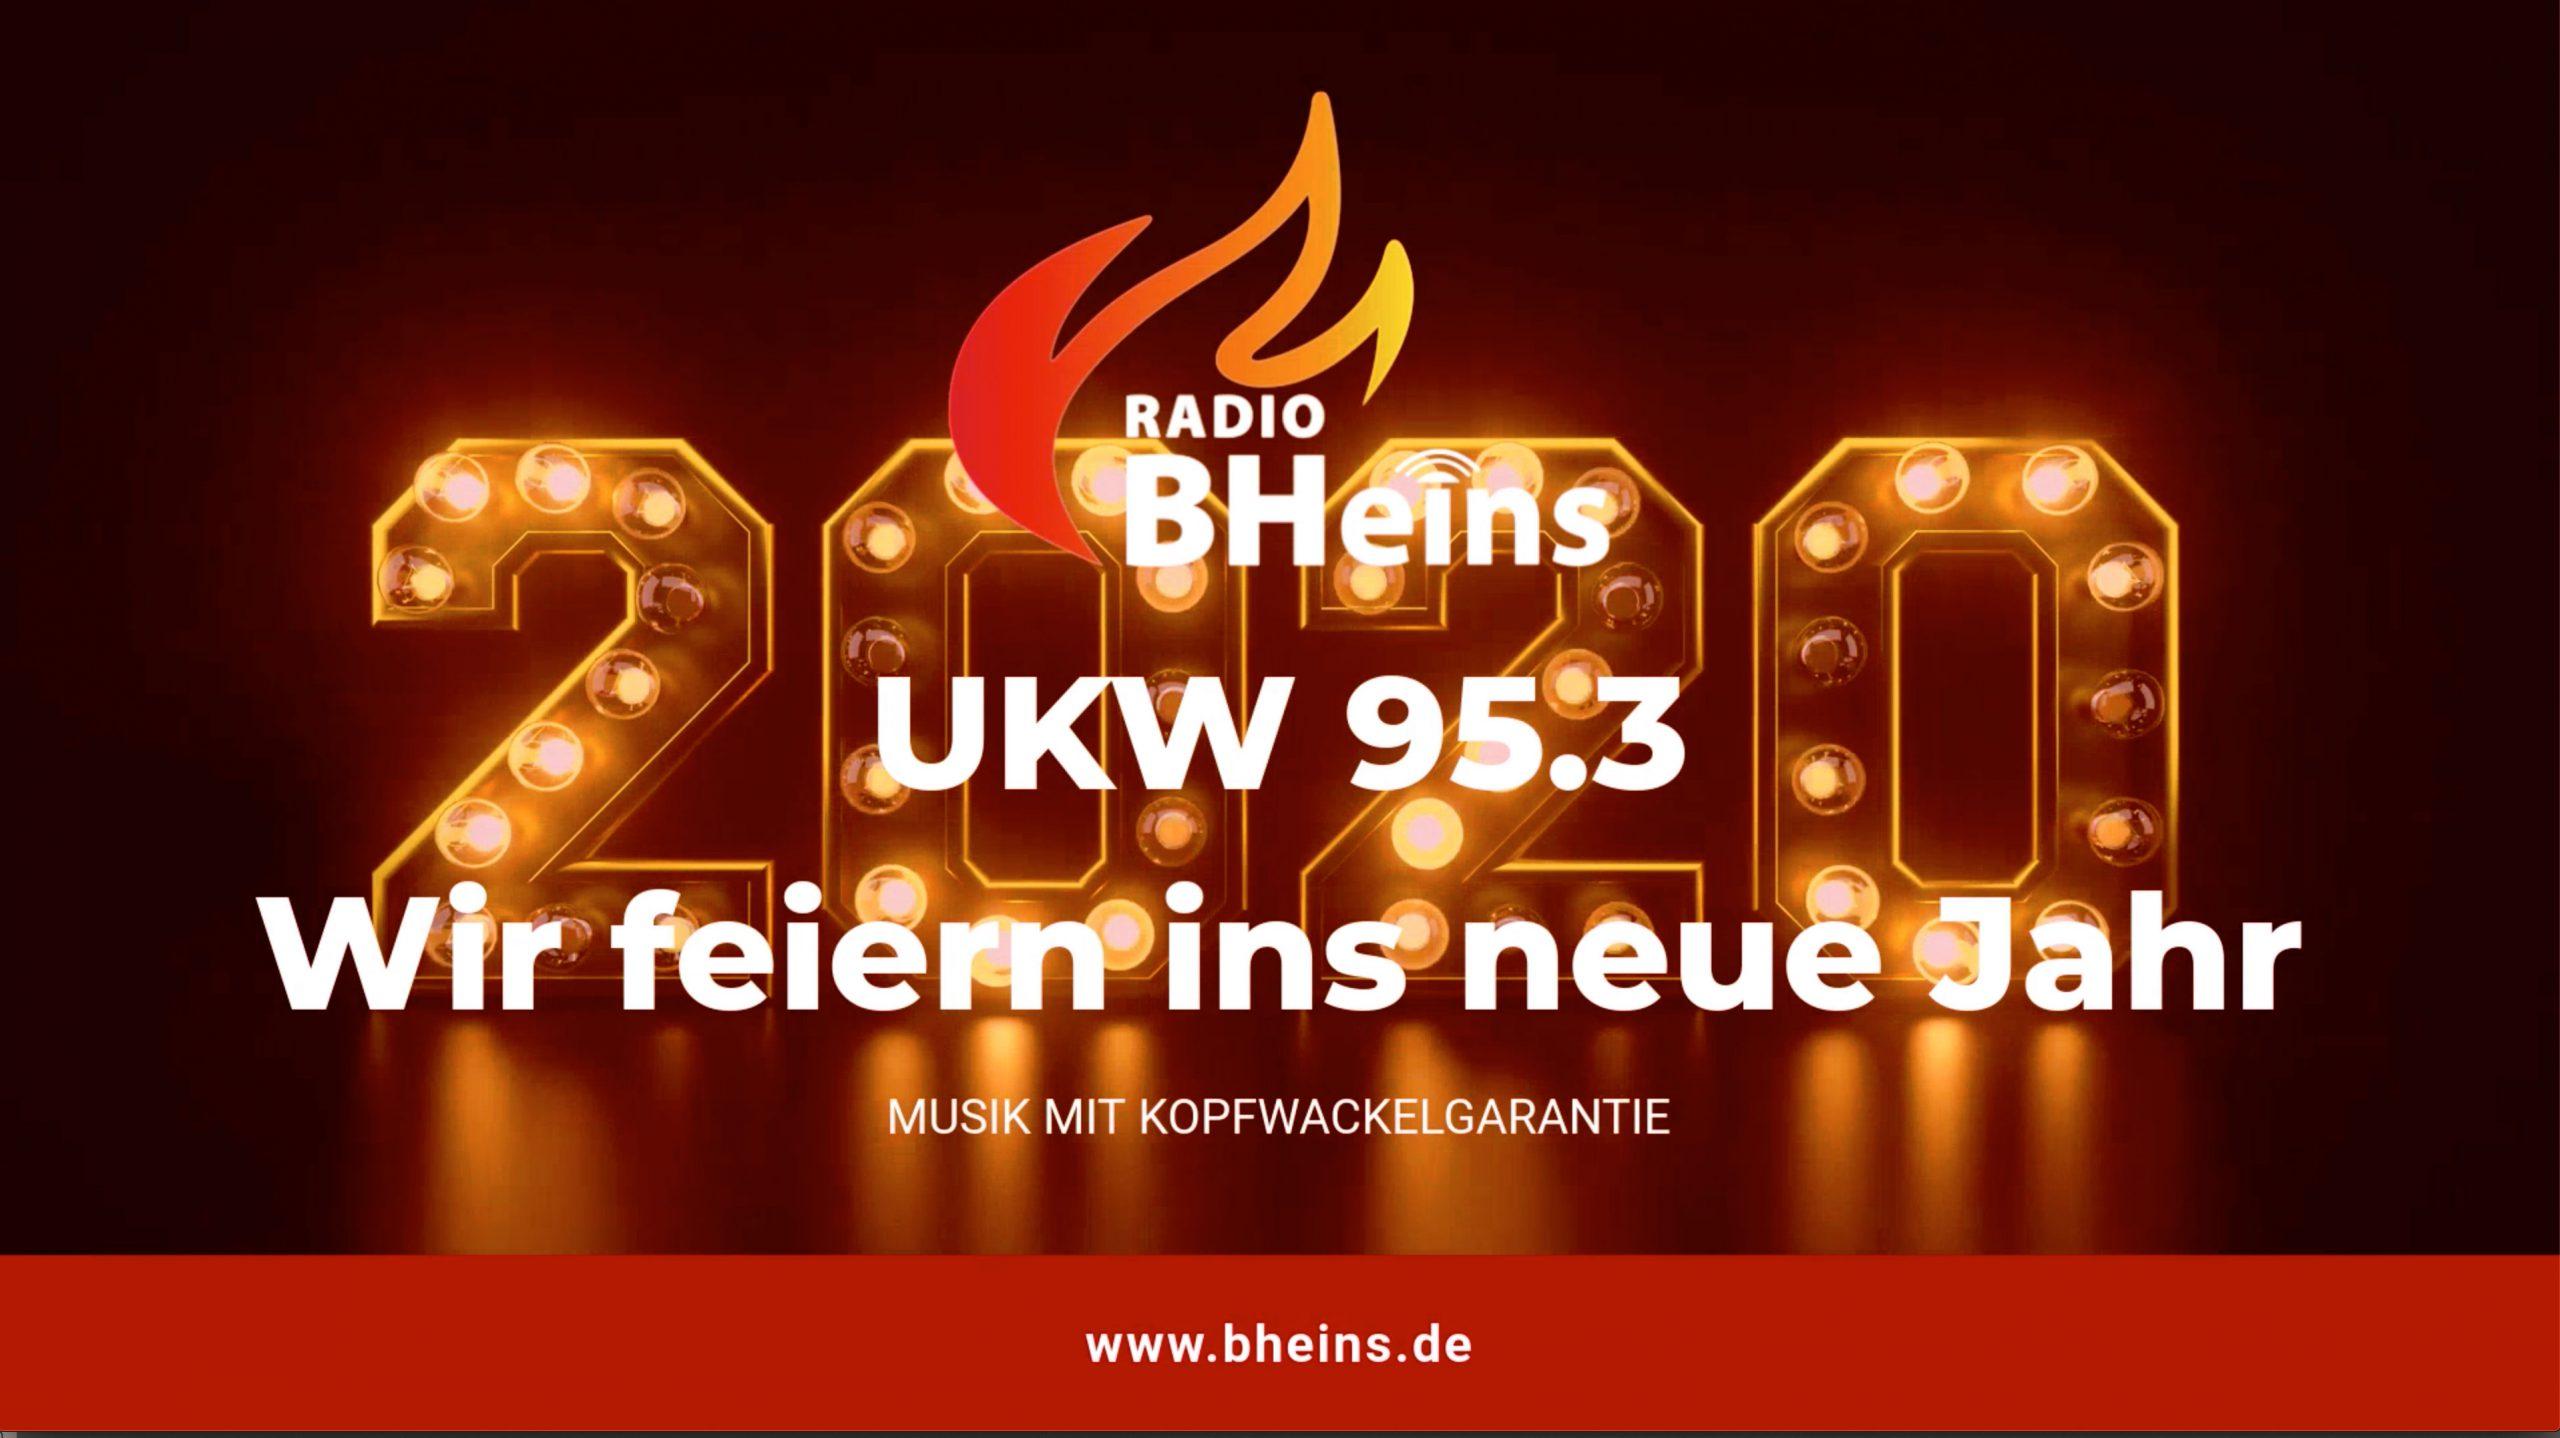 Radio BHeins Silvester 2019/20